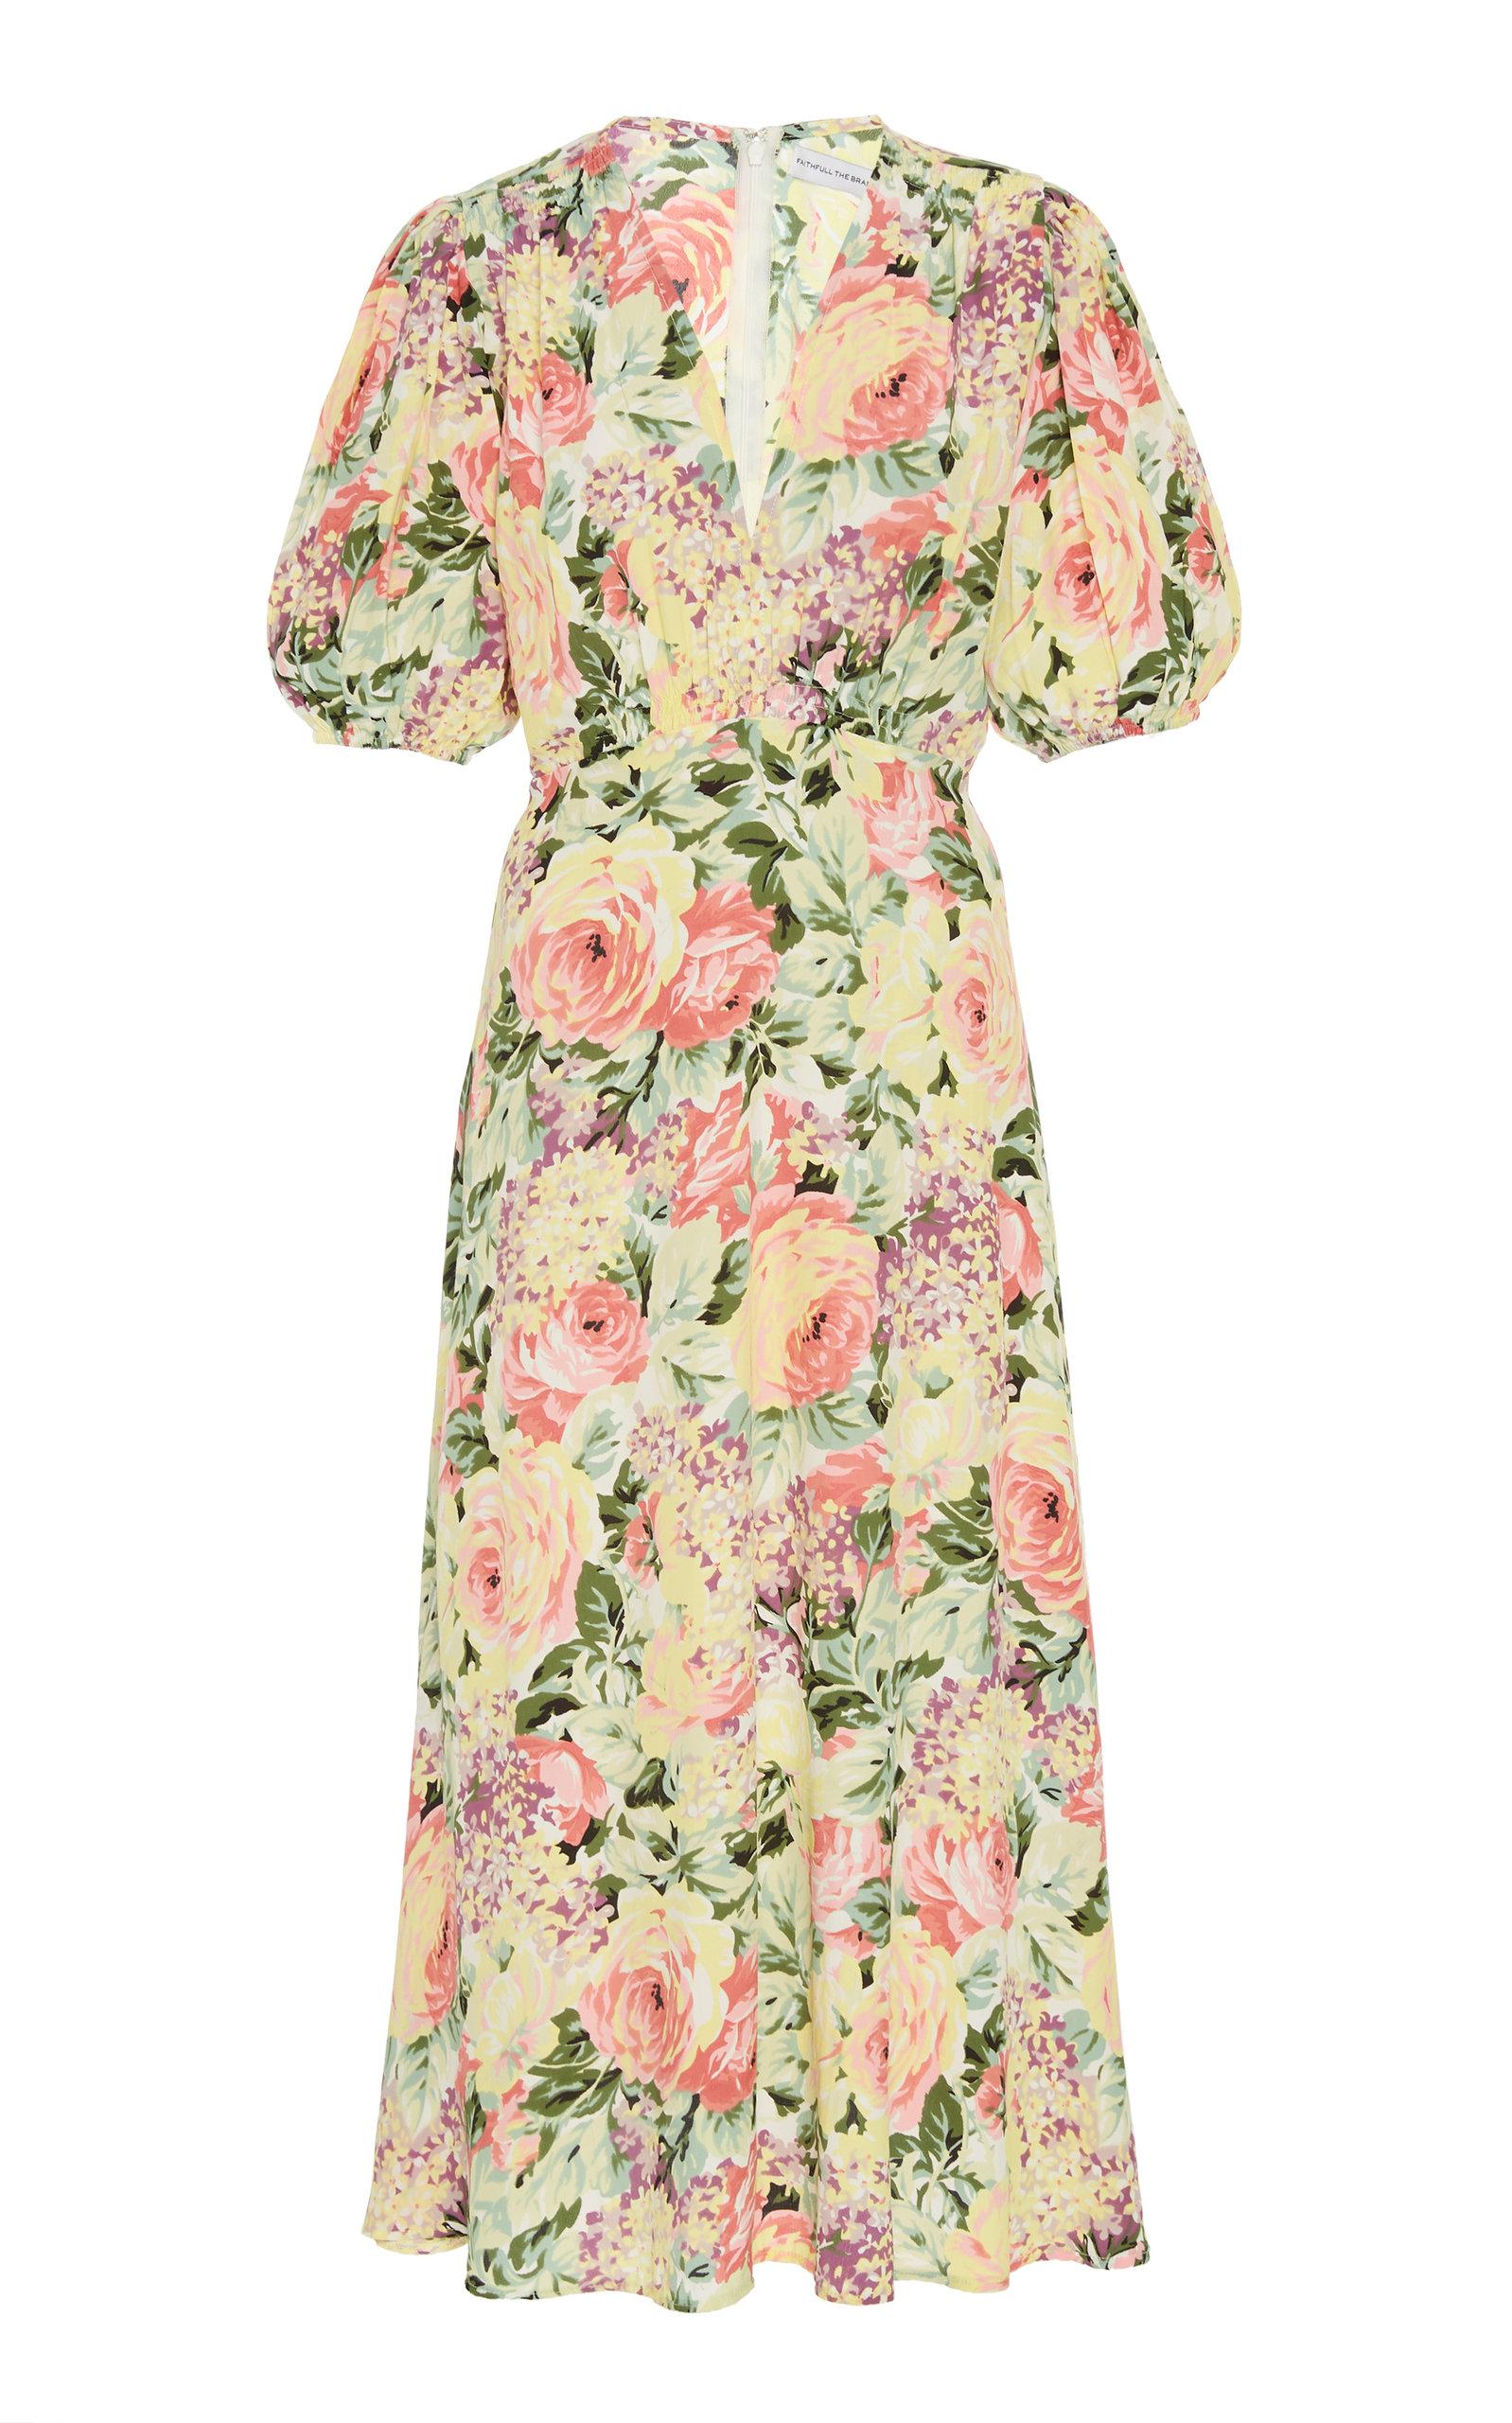 Buy Faithfull The Brand Vittoria Floral-Print Crepe Midi Dress online, shop Faithfull The Brand at the best price